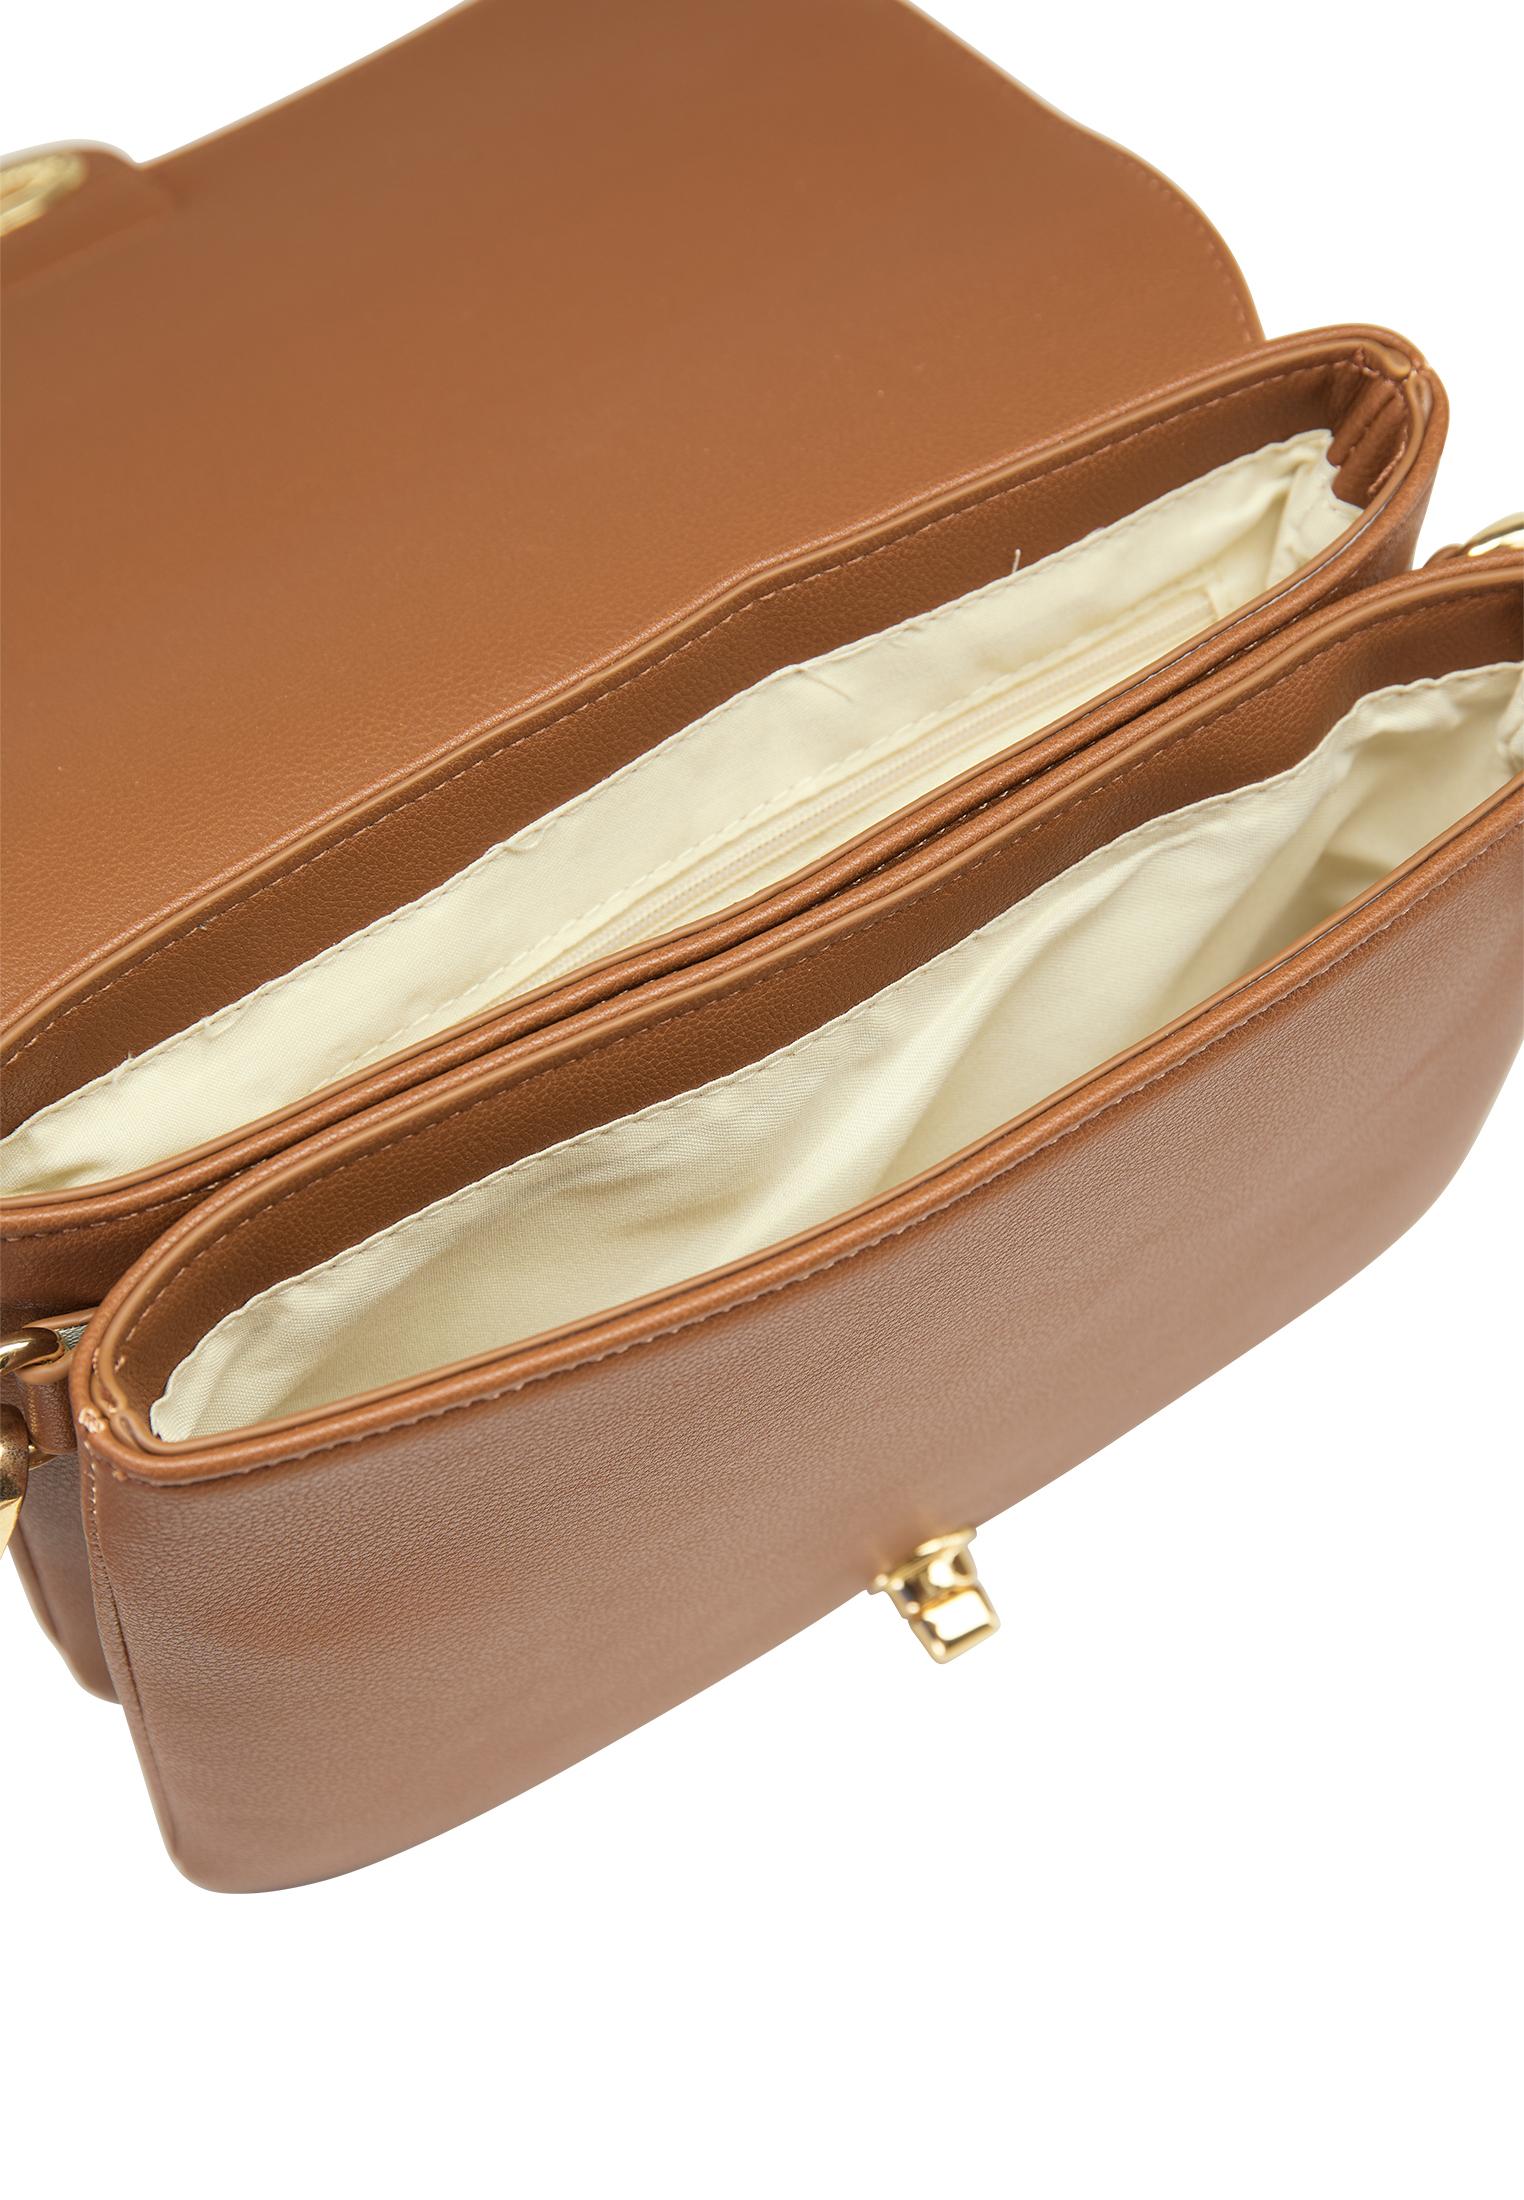 Usha Crossbody Bag in cognac günstig kaufen